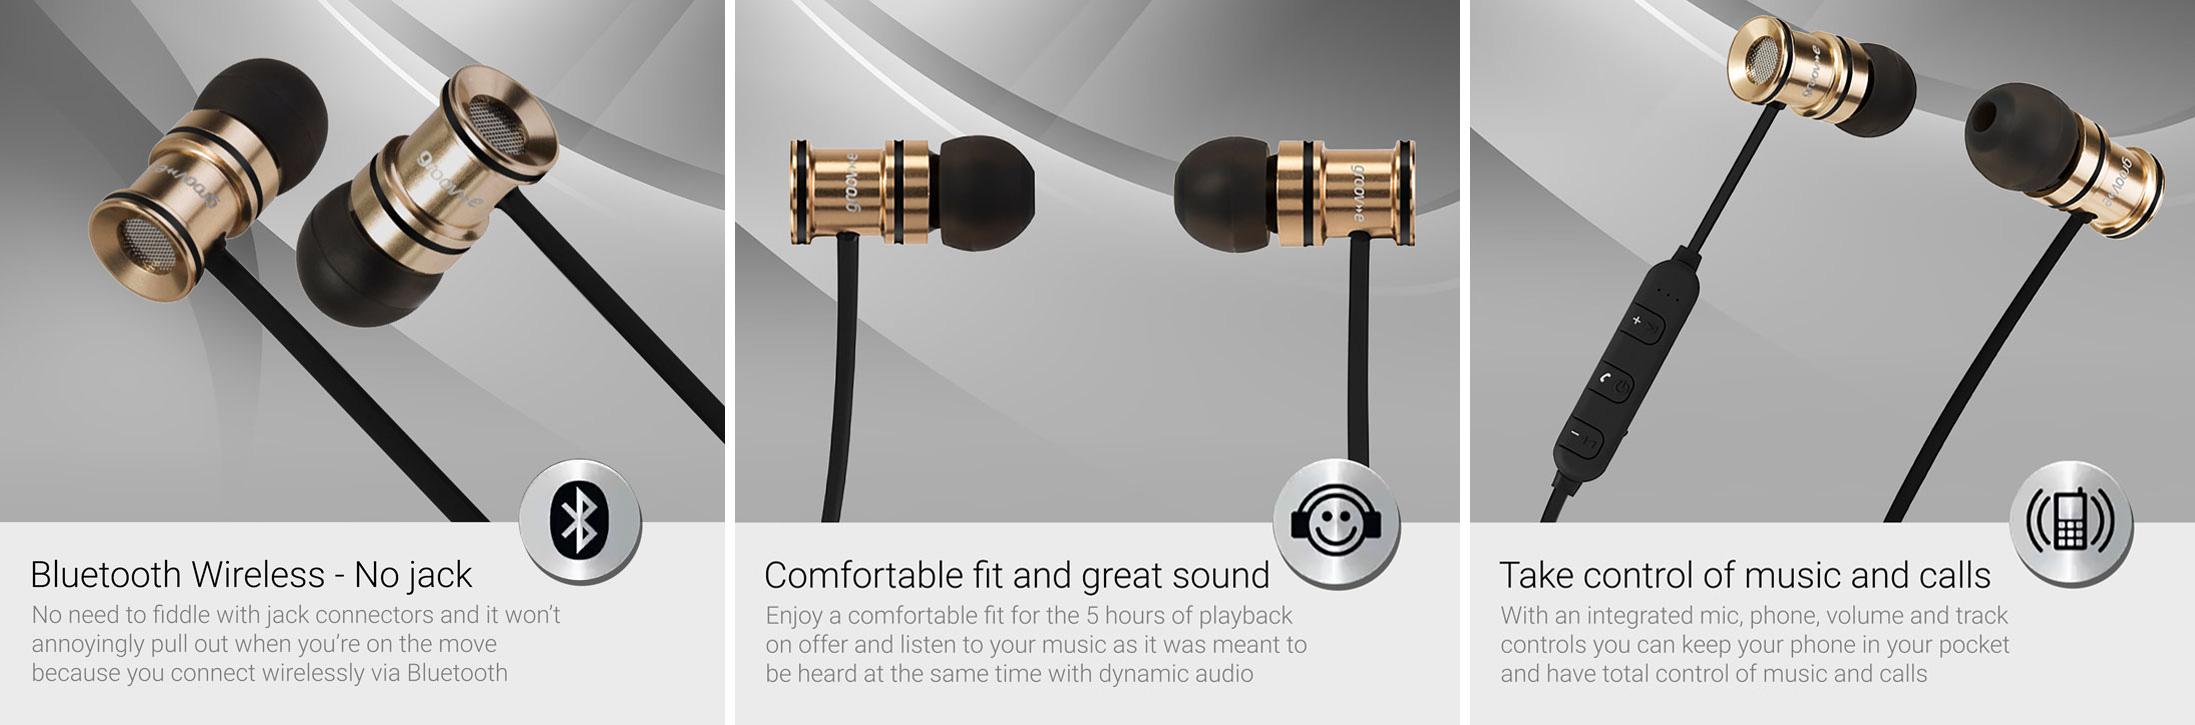 865ecc2d159 Best iPhone X headphones | Mobile Fun Blog